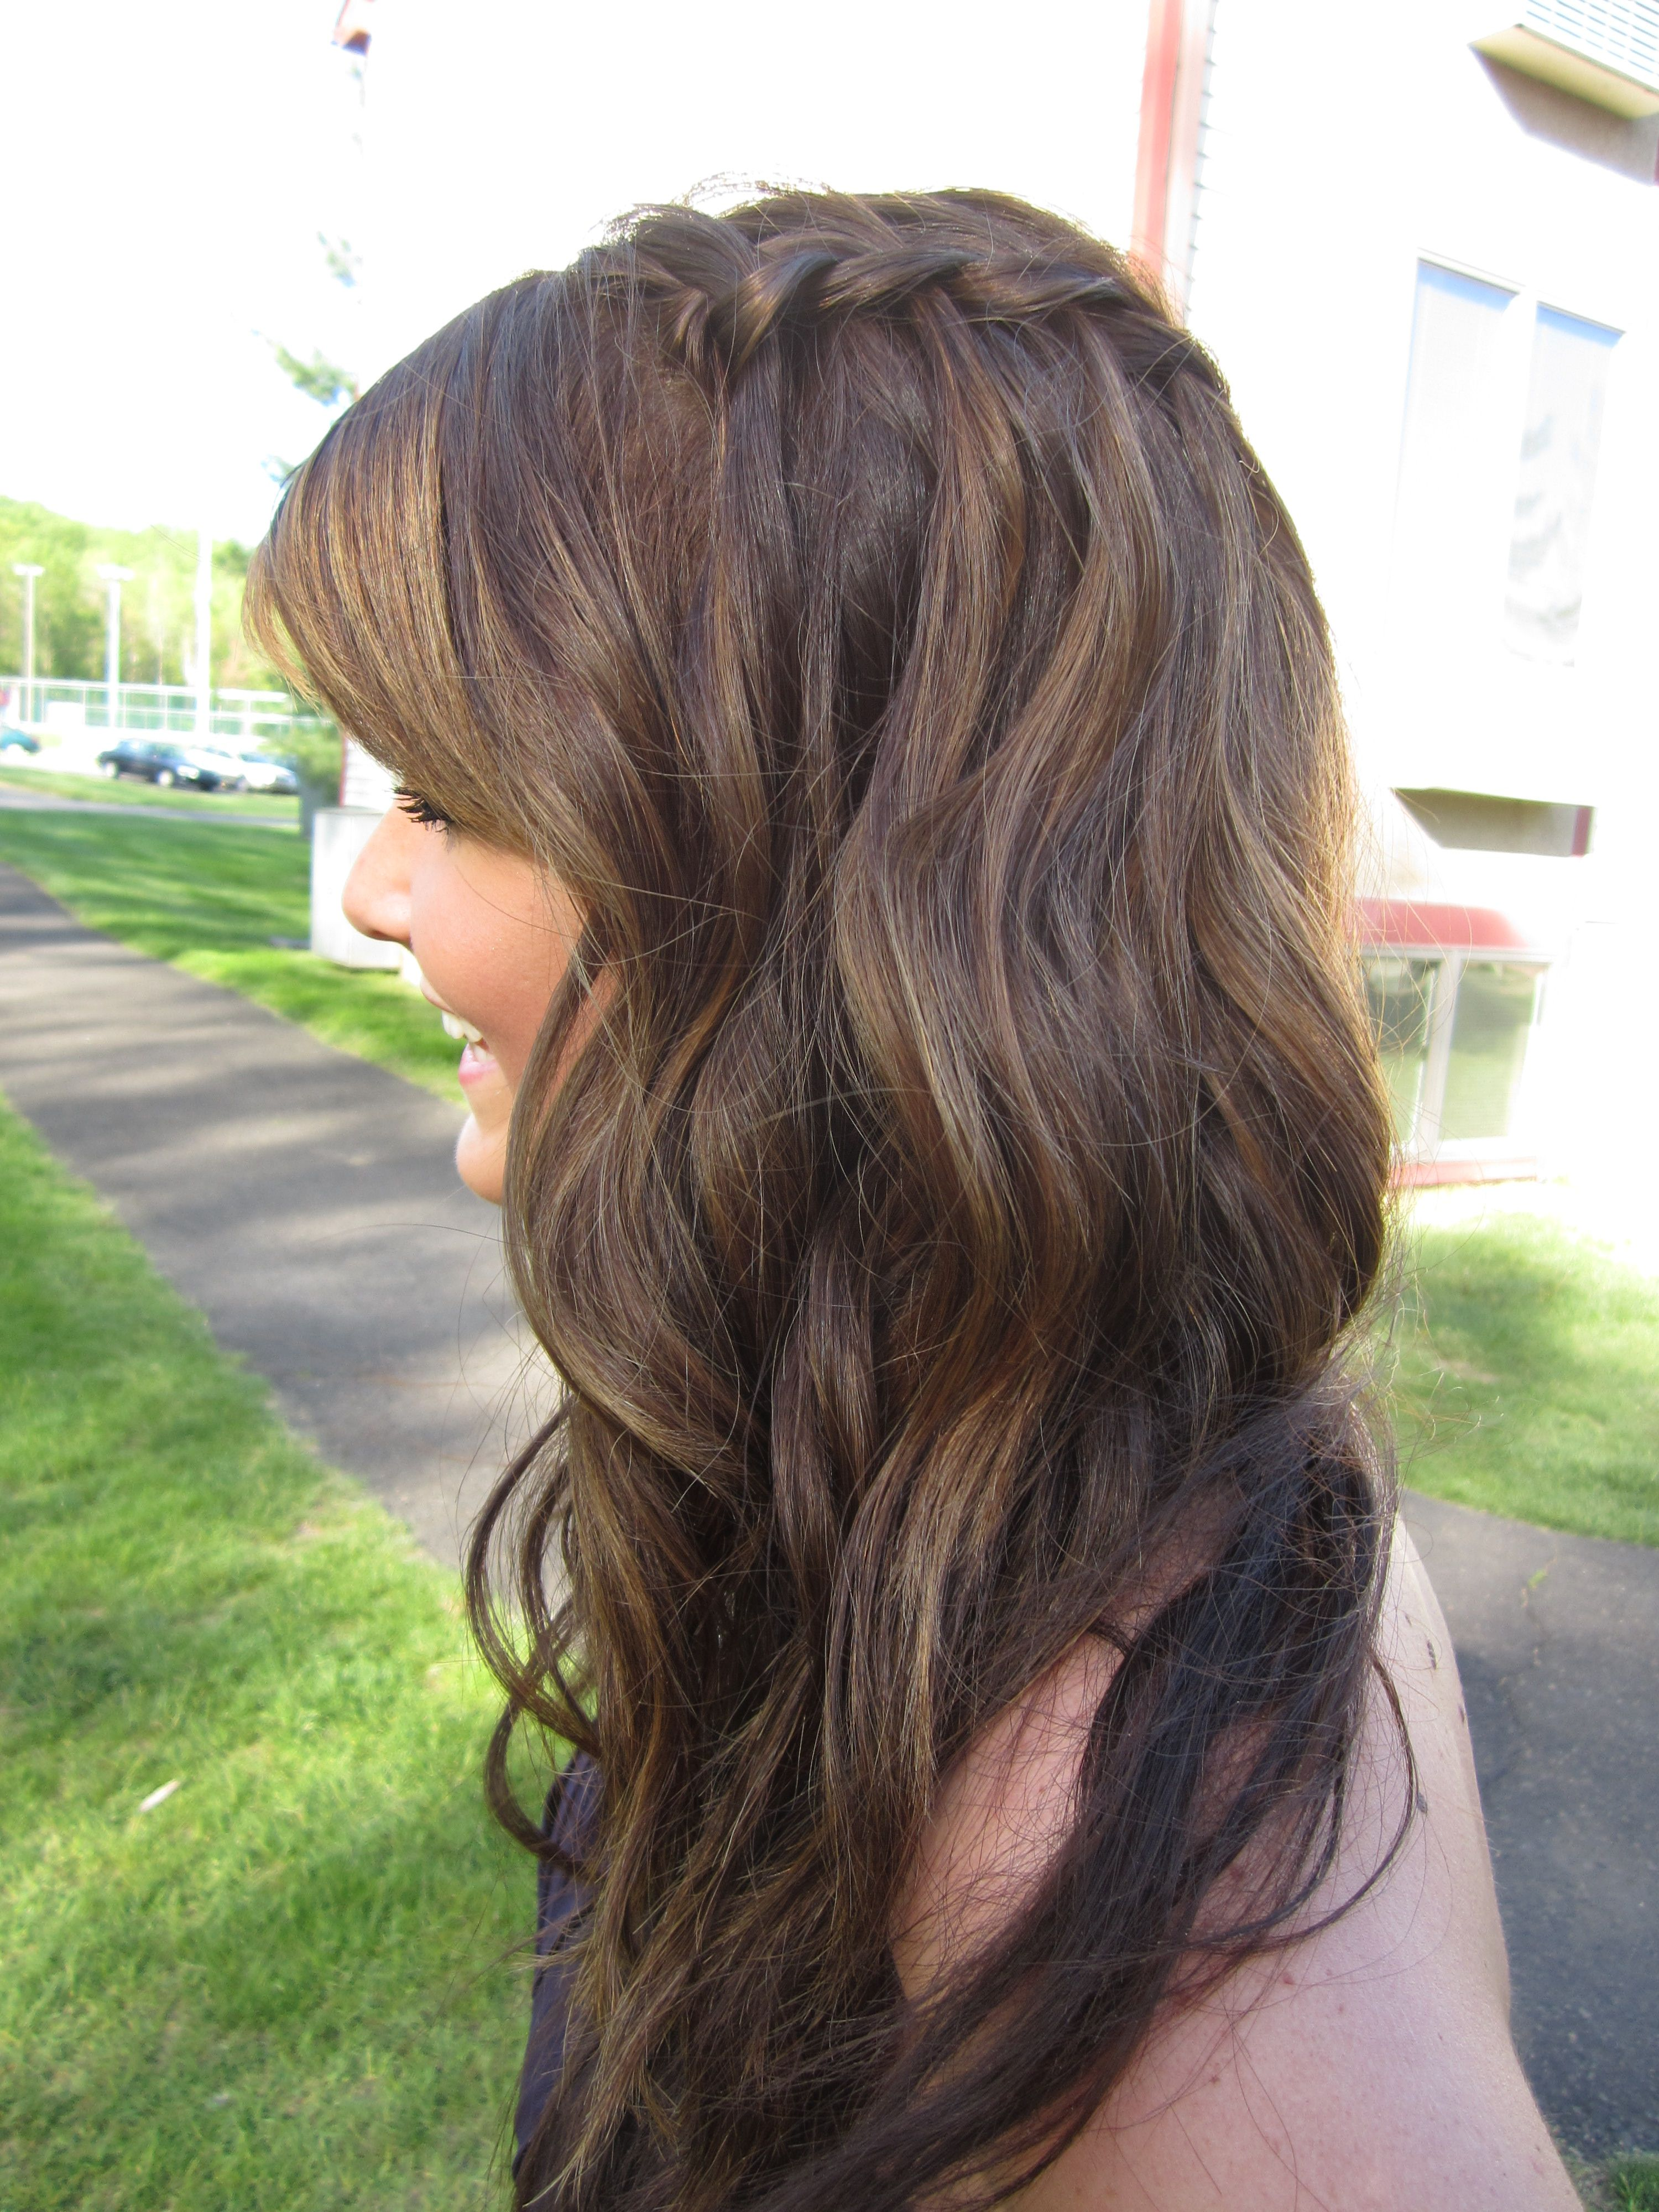 Waterfall braid started further back wedding ud pinterest